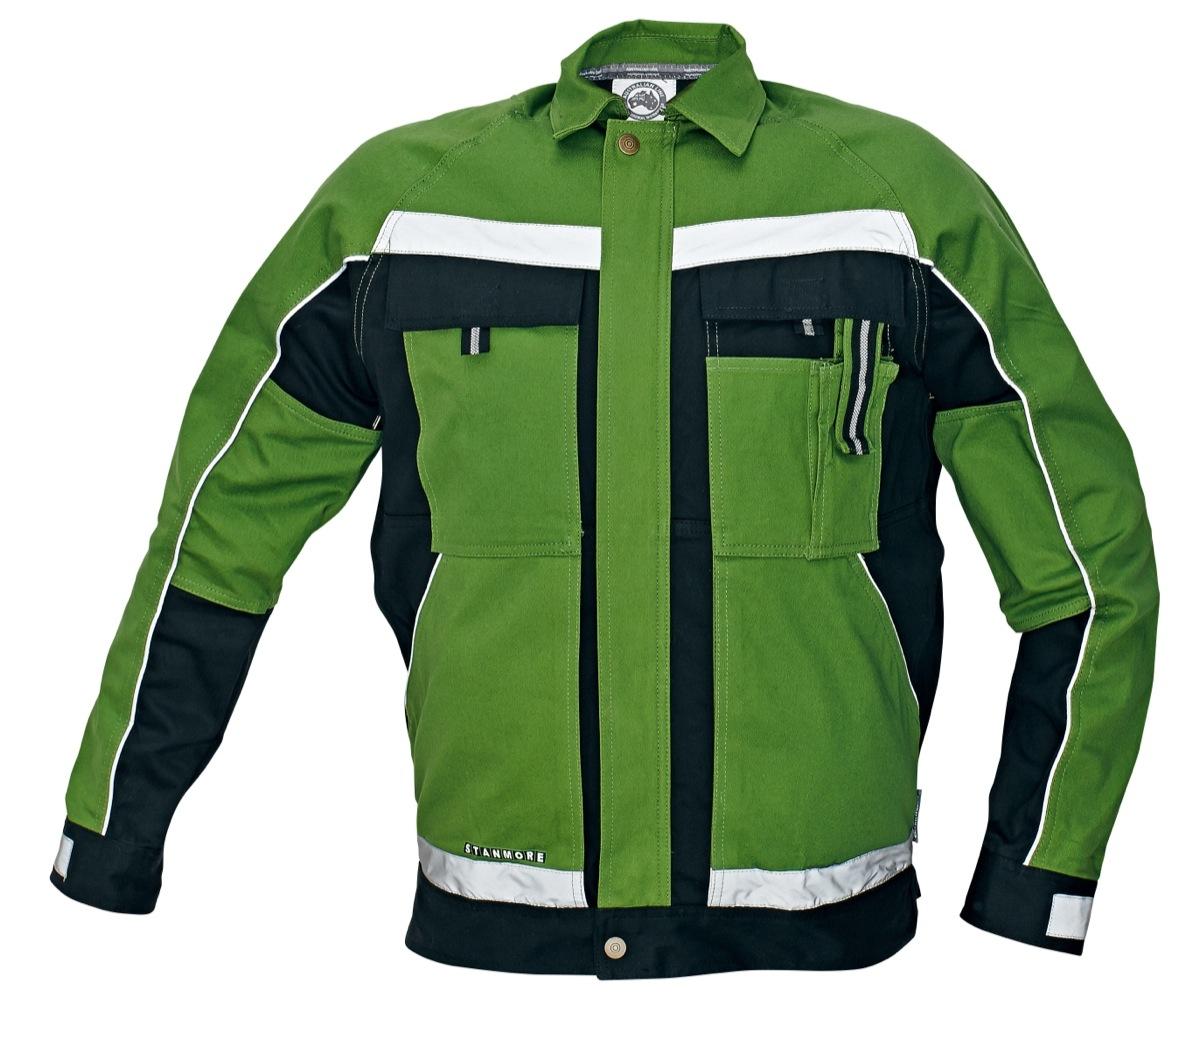 STANMORE dzseki zöld